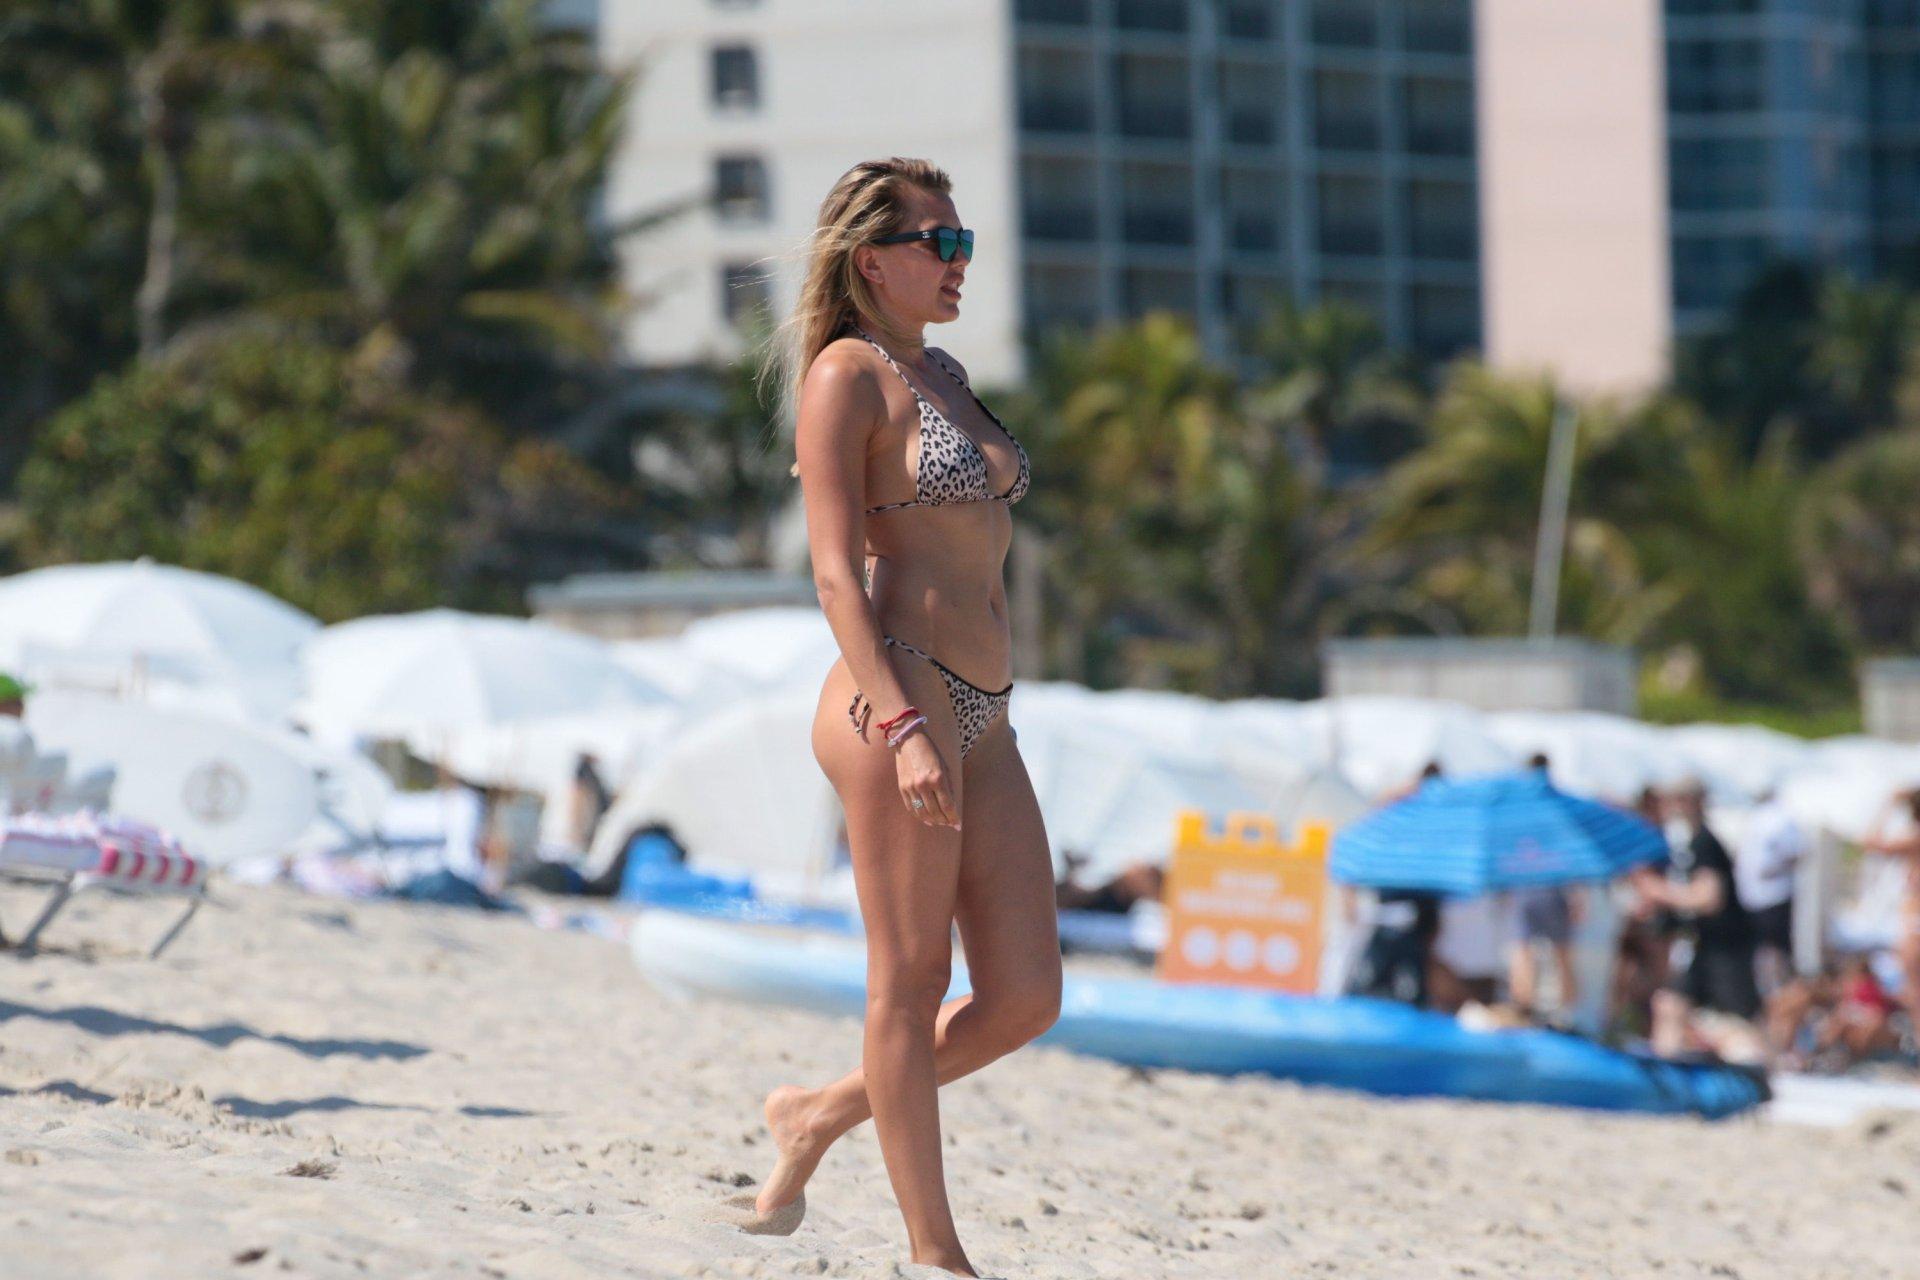 Nude Tetyana Veryovkina nudes (35 photo), Pussy, Leaked, Selfie, panties 2018